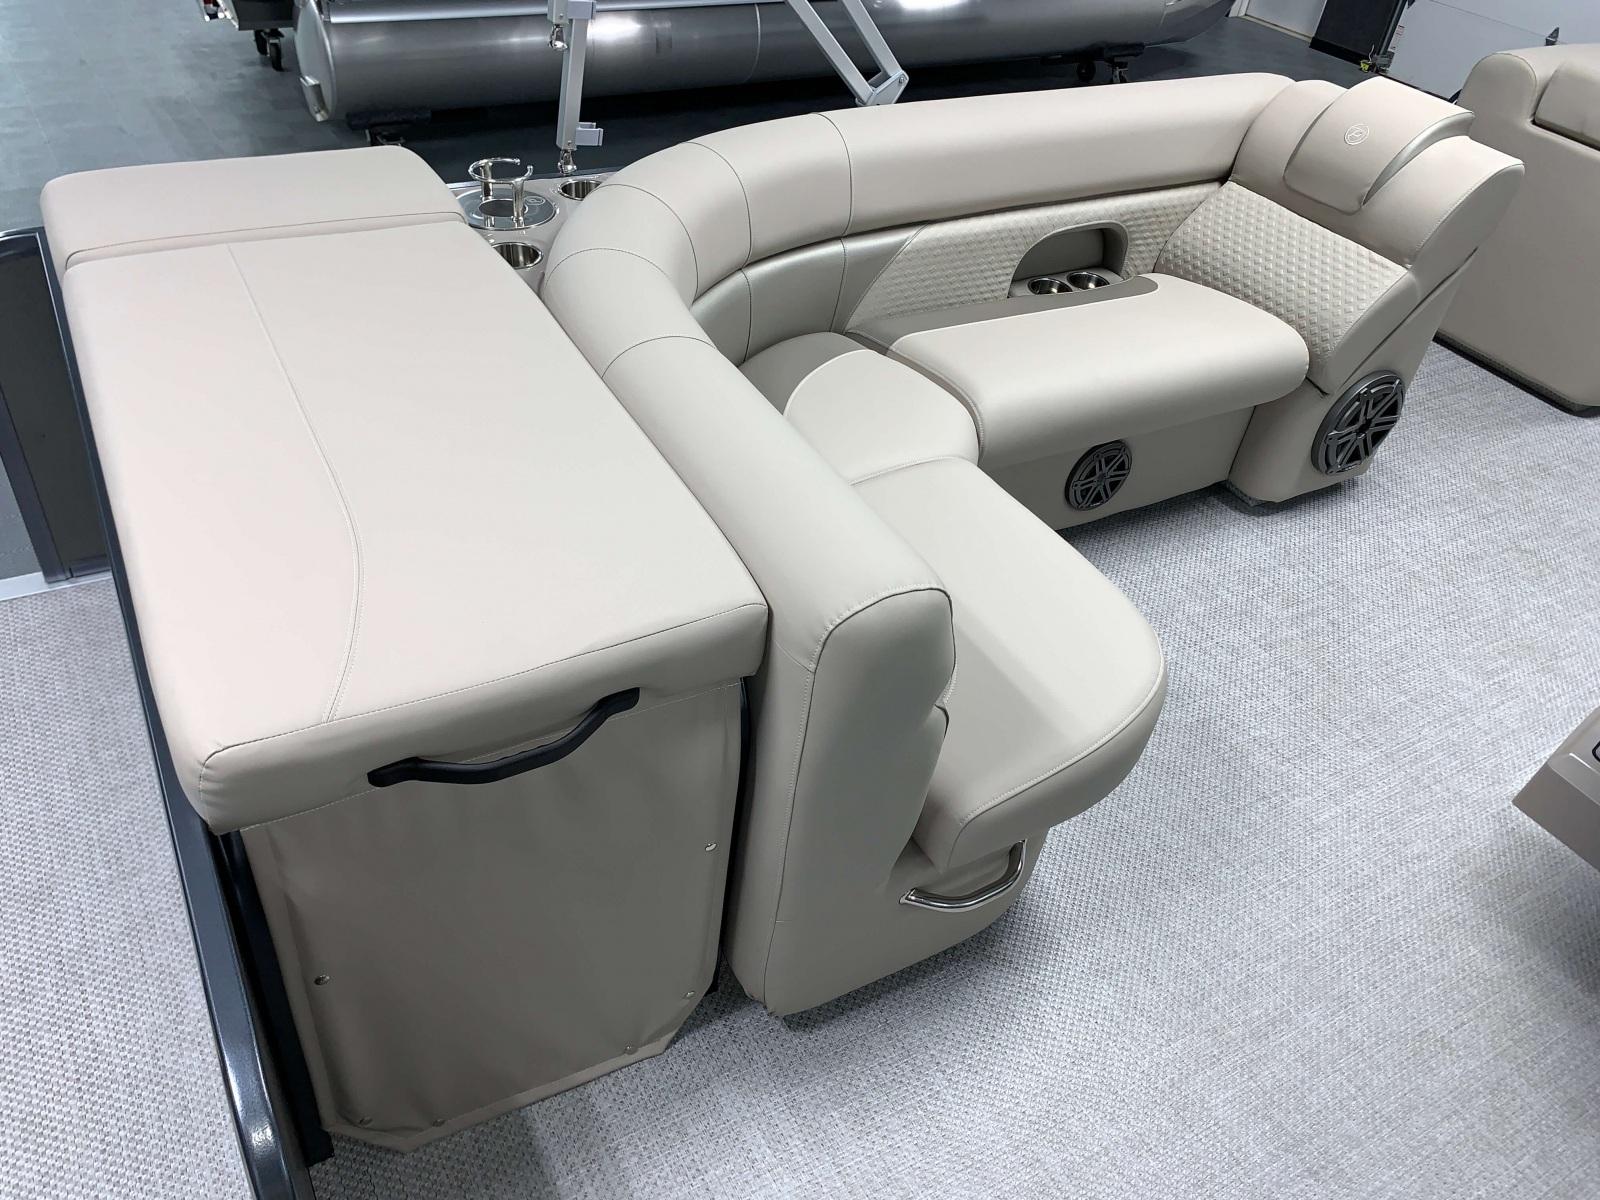 Rear Layout Sunpad of a 2020 Premier 220 Sunsation RE Pontoon Boat